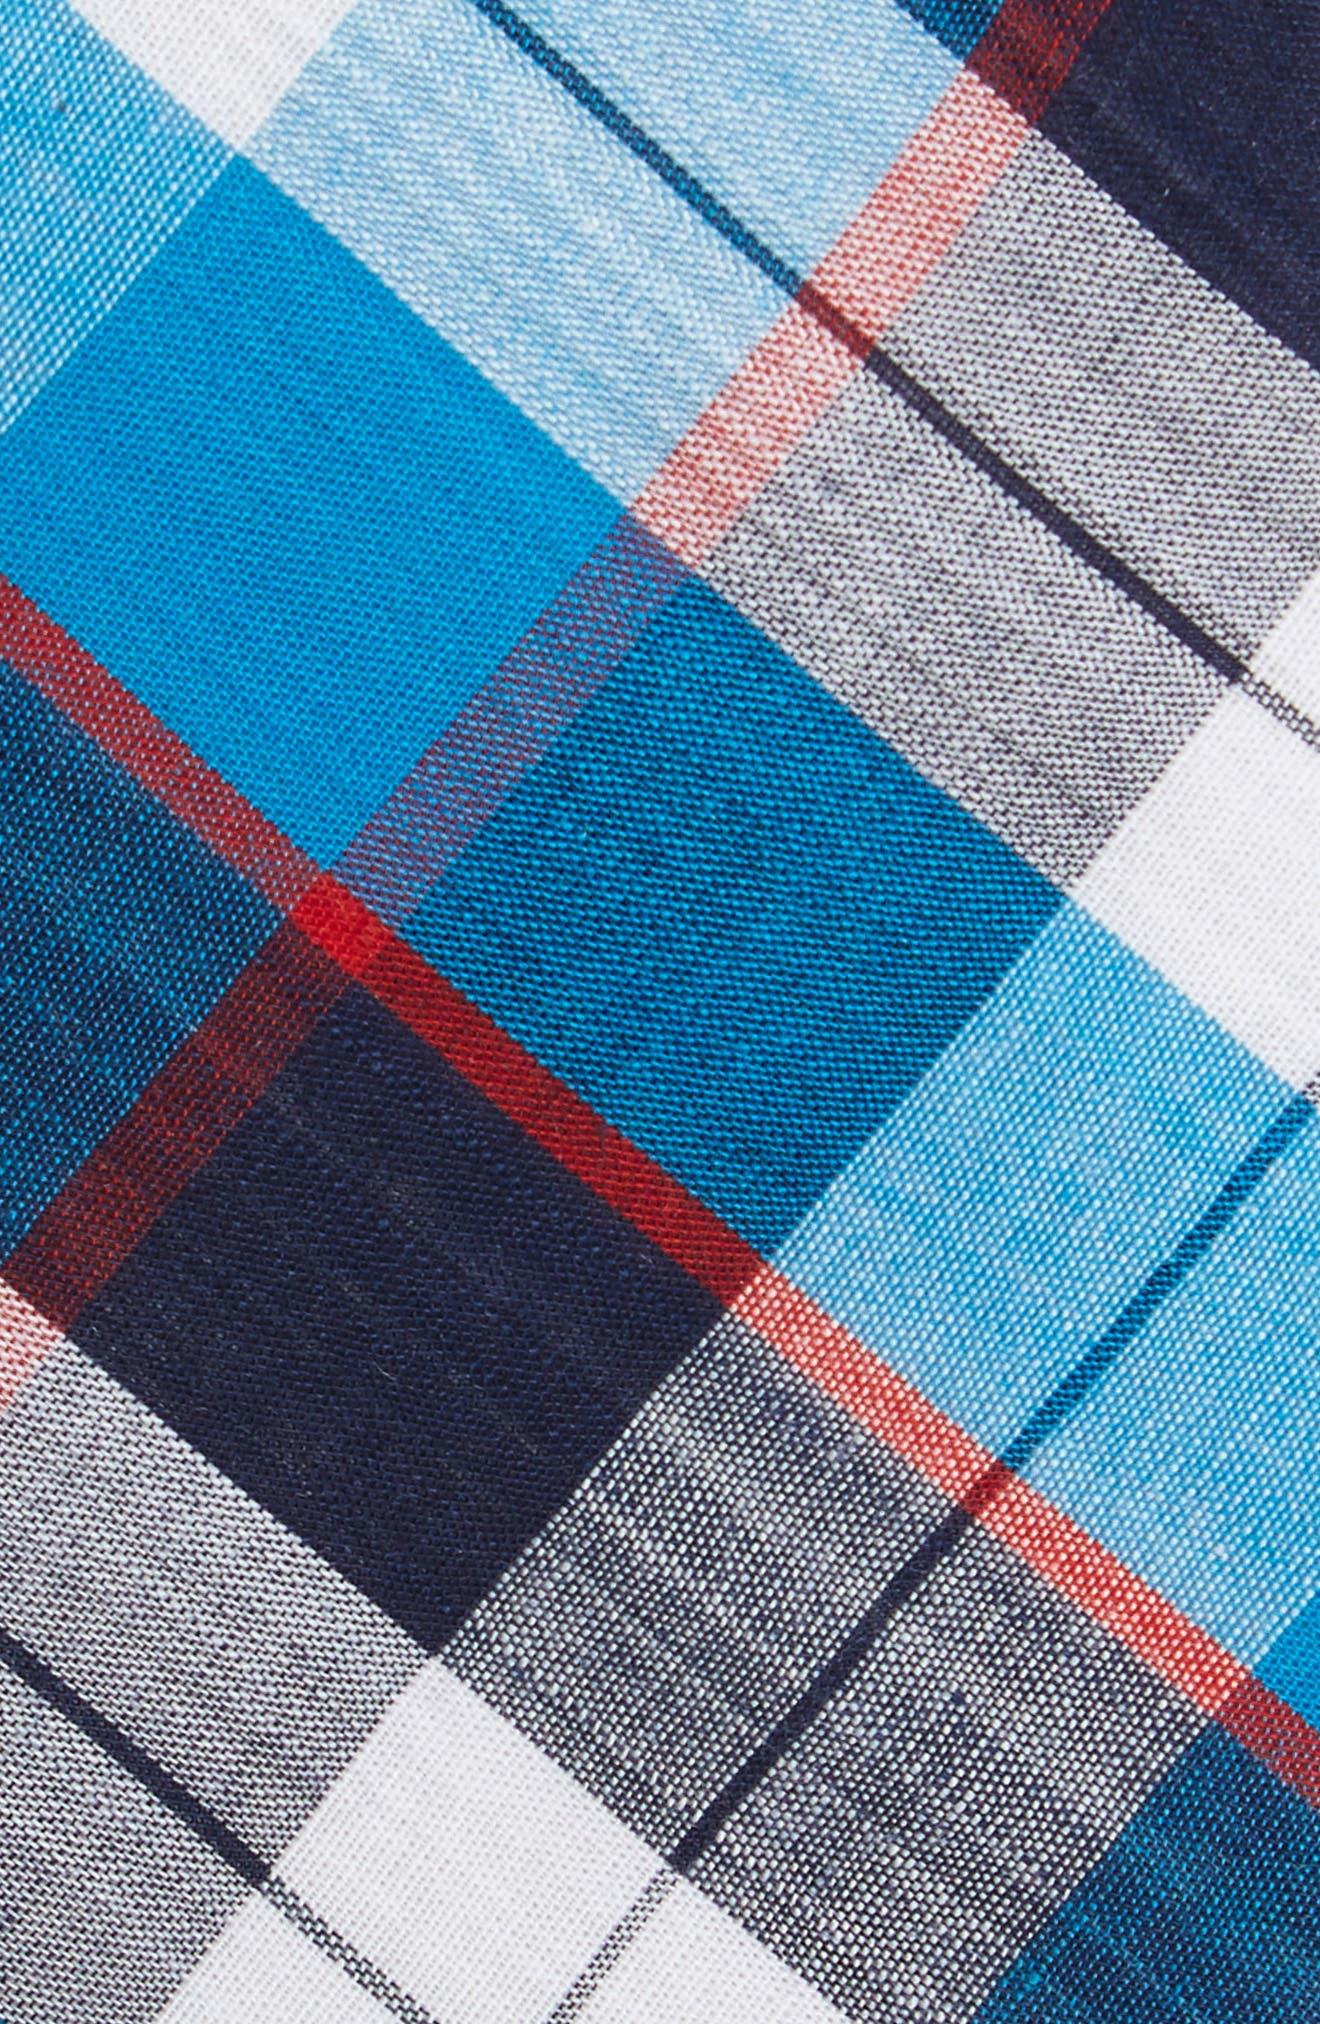 Esterbrook Plaid Cotton Skinny Tie,                             Alternate thumbnail 2, color,                             410